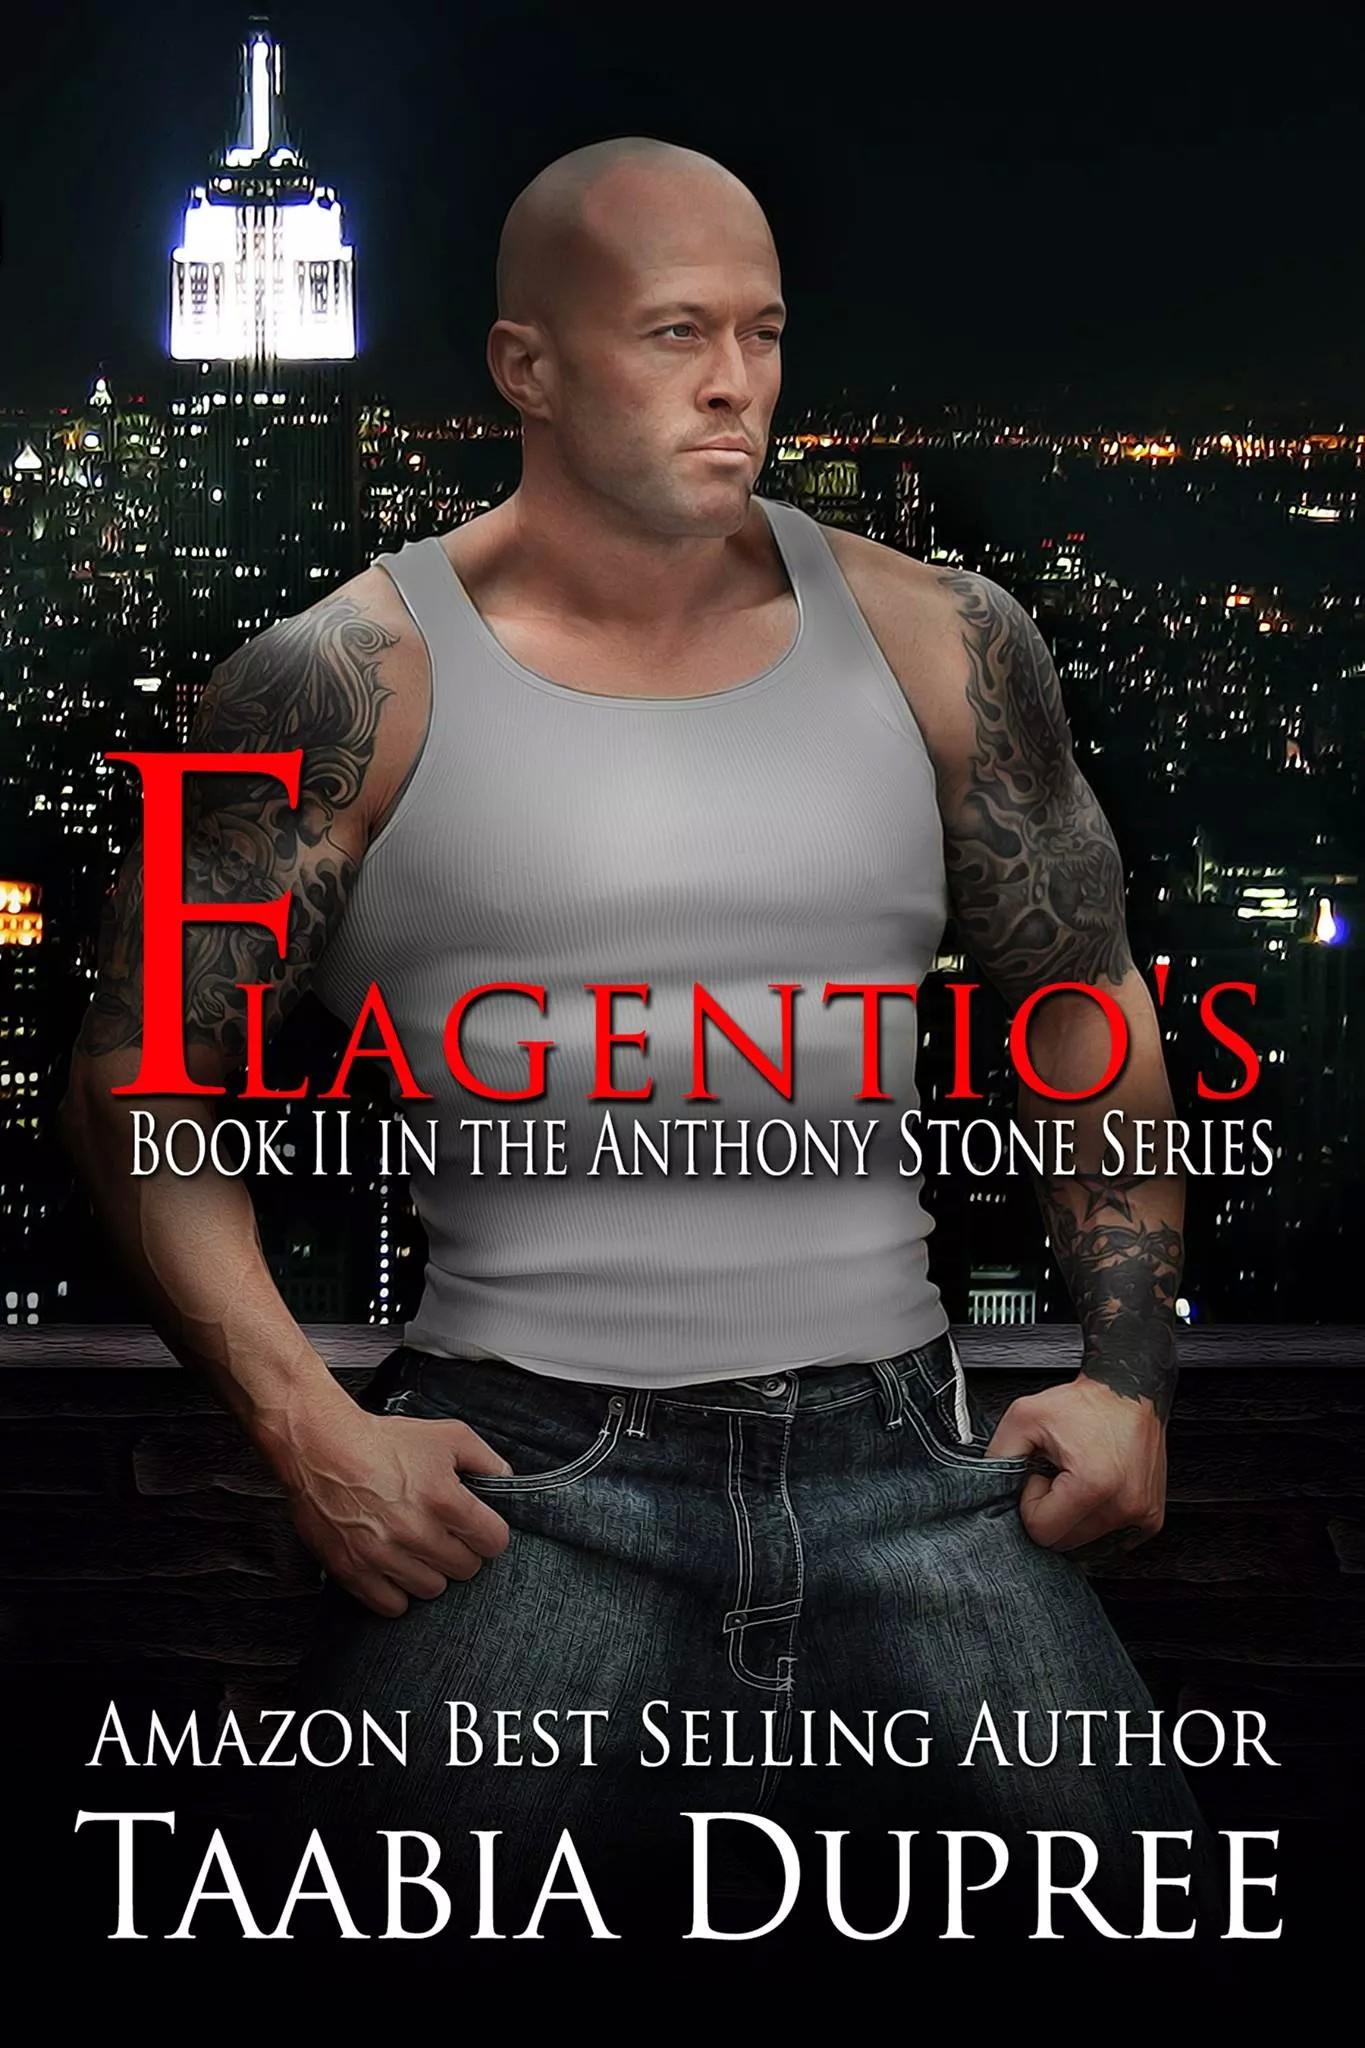 Romance Cover Model John Quinlan Flagentio's